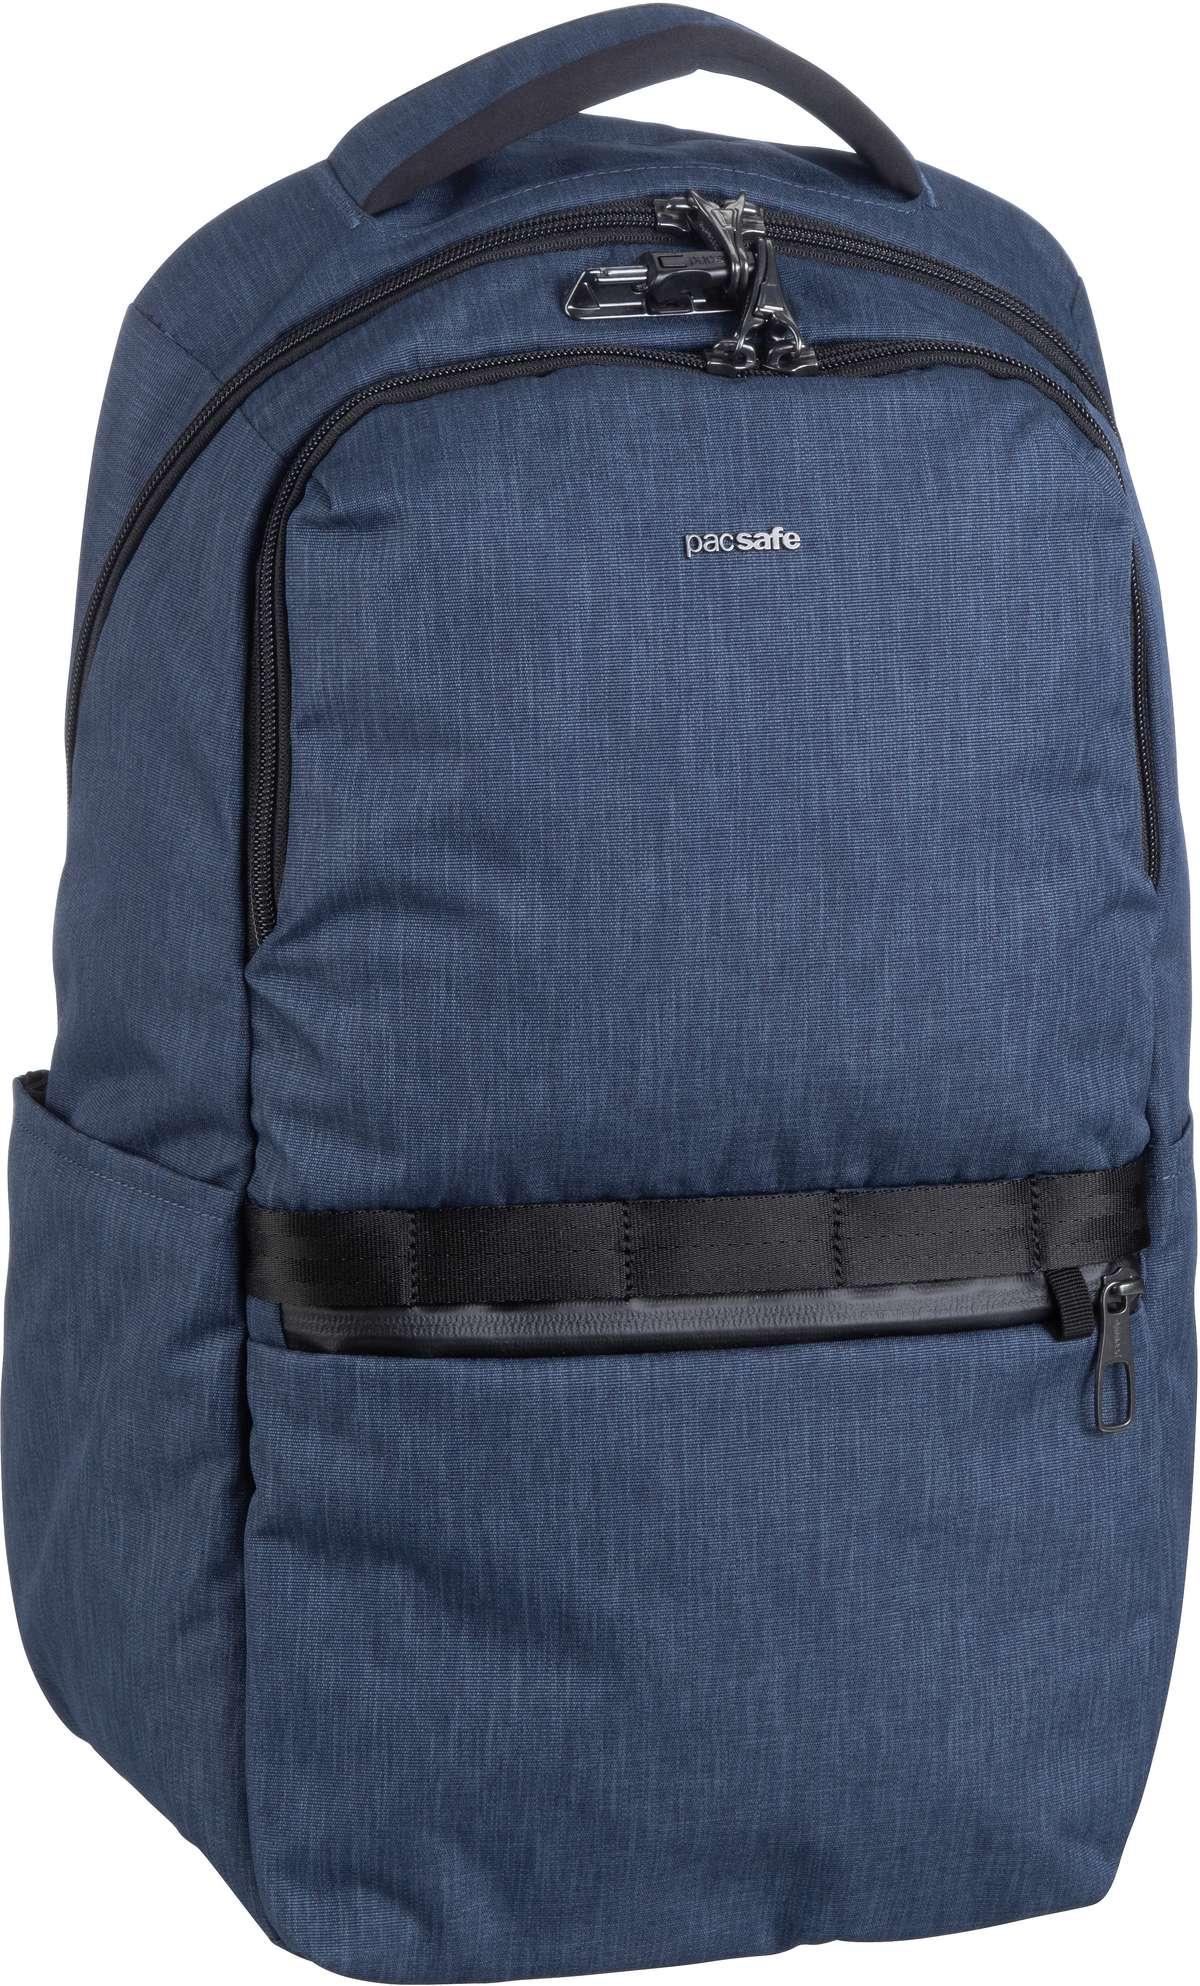 Rucksack / Daypack Metrosafe X 25L Backpack Dark Denim (25 Liter)